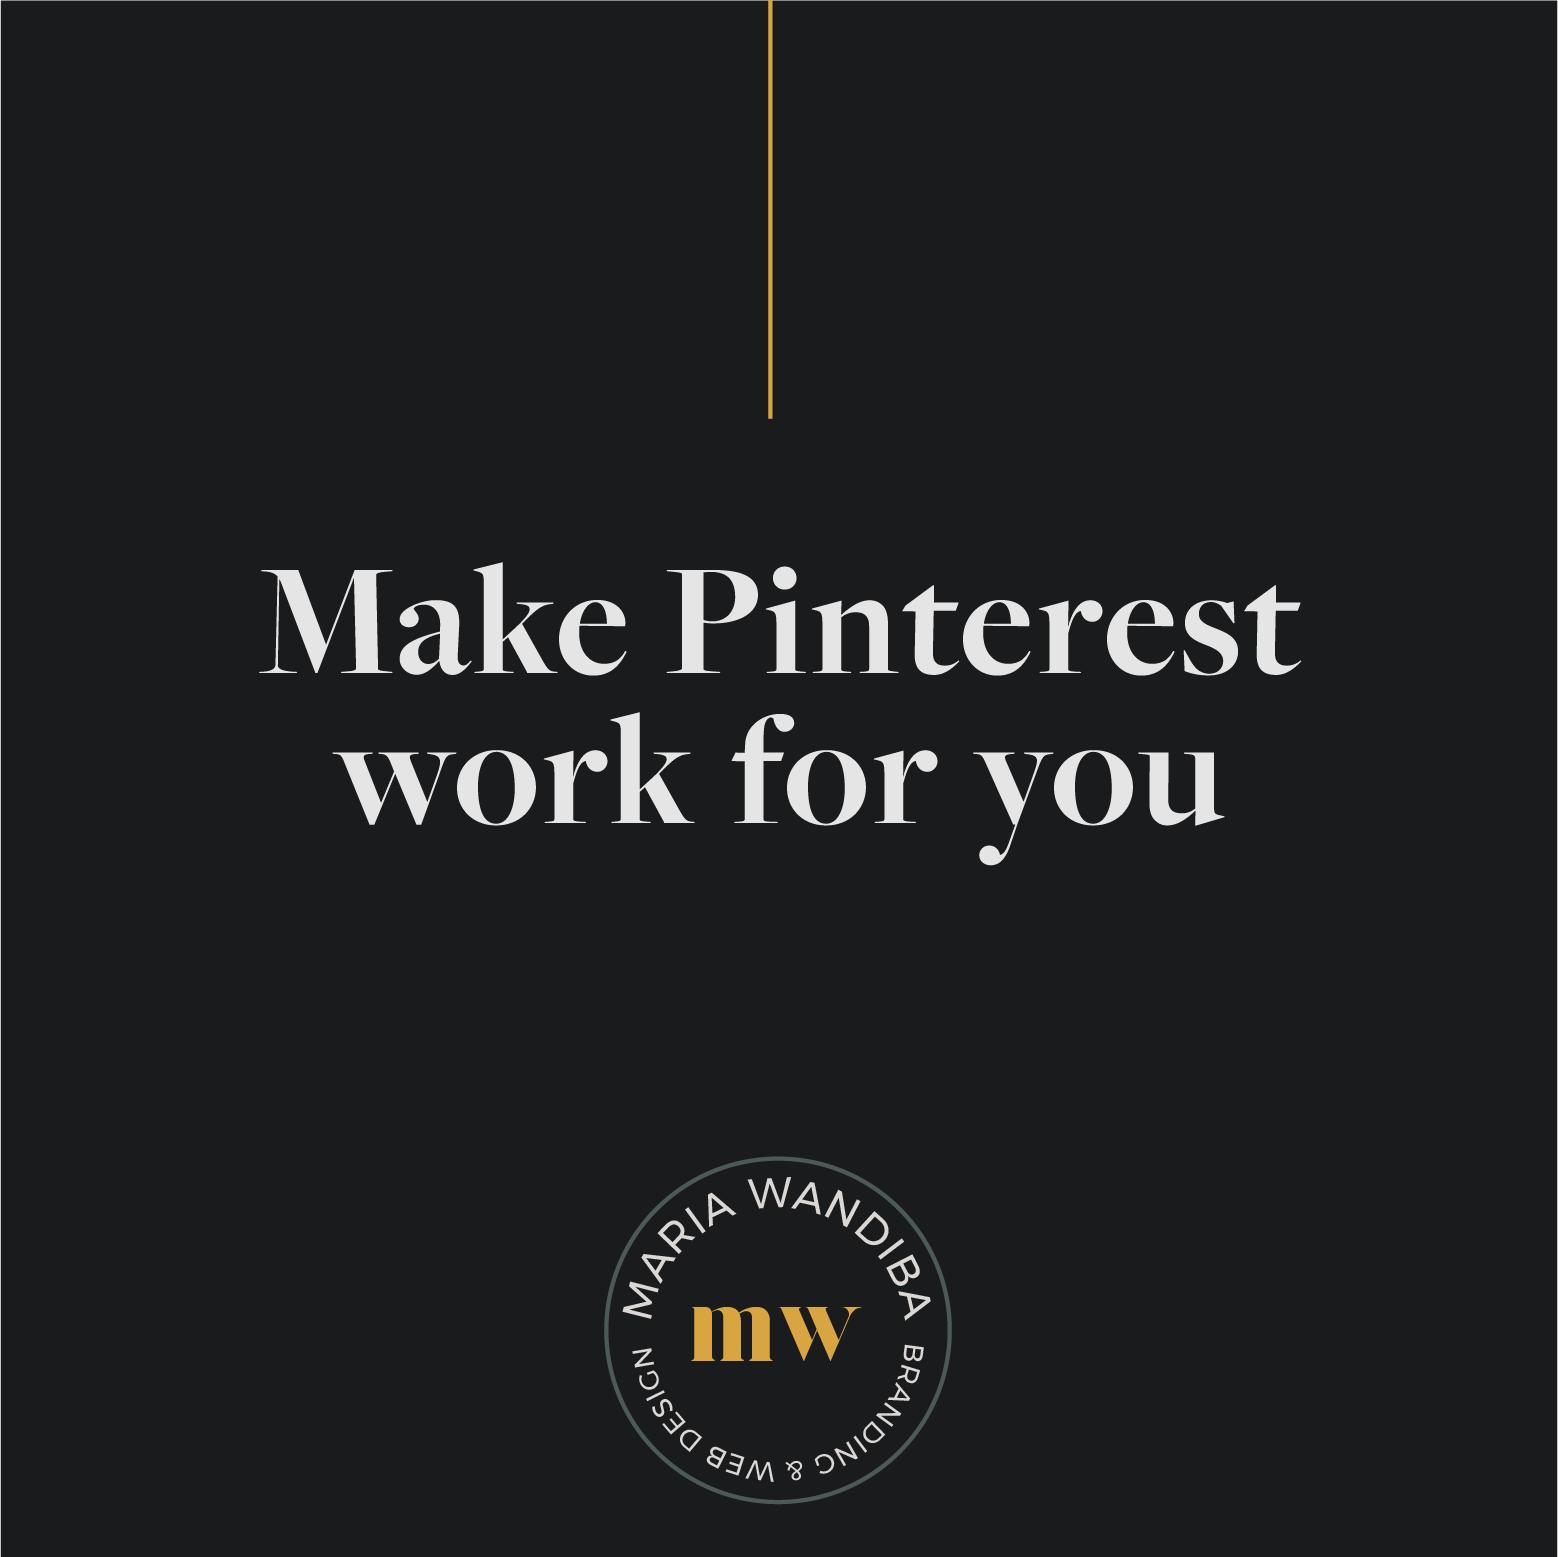 Make Pinterest work for you